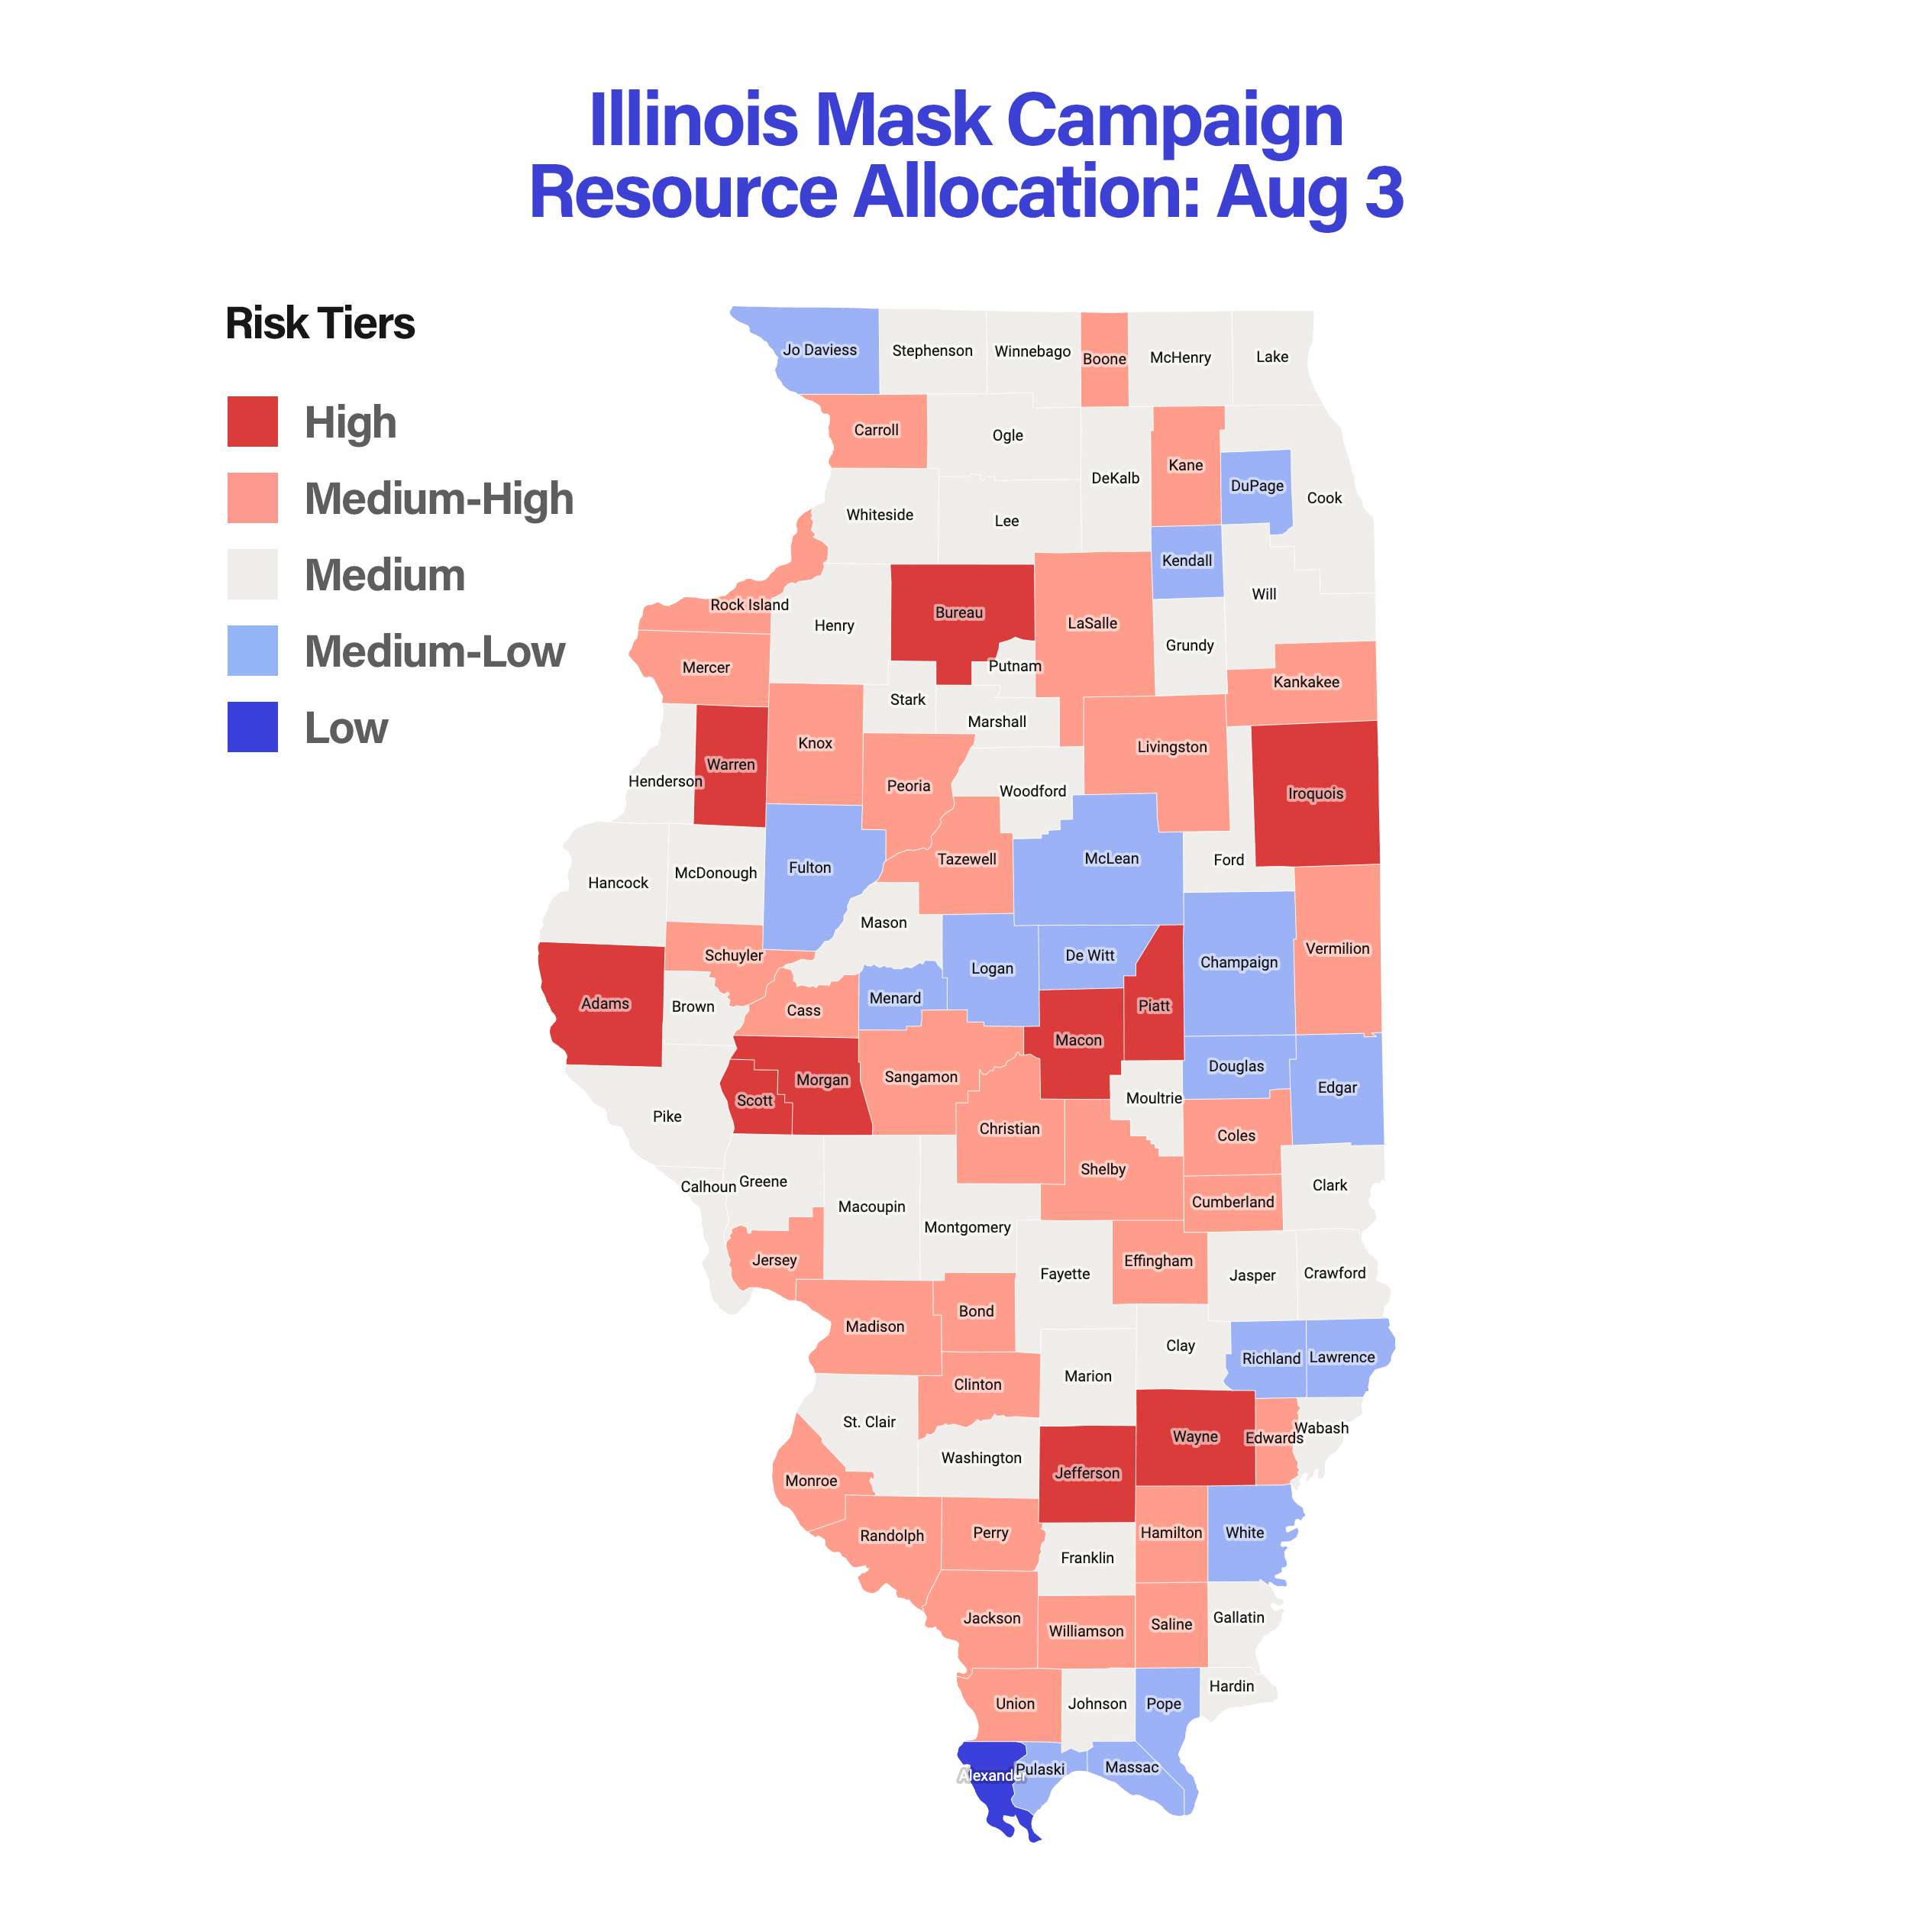 Illinois Mask Campaign Resource Allocation: Aug 3